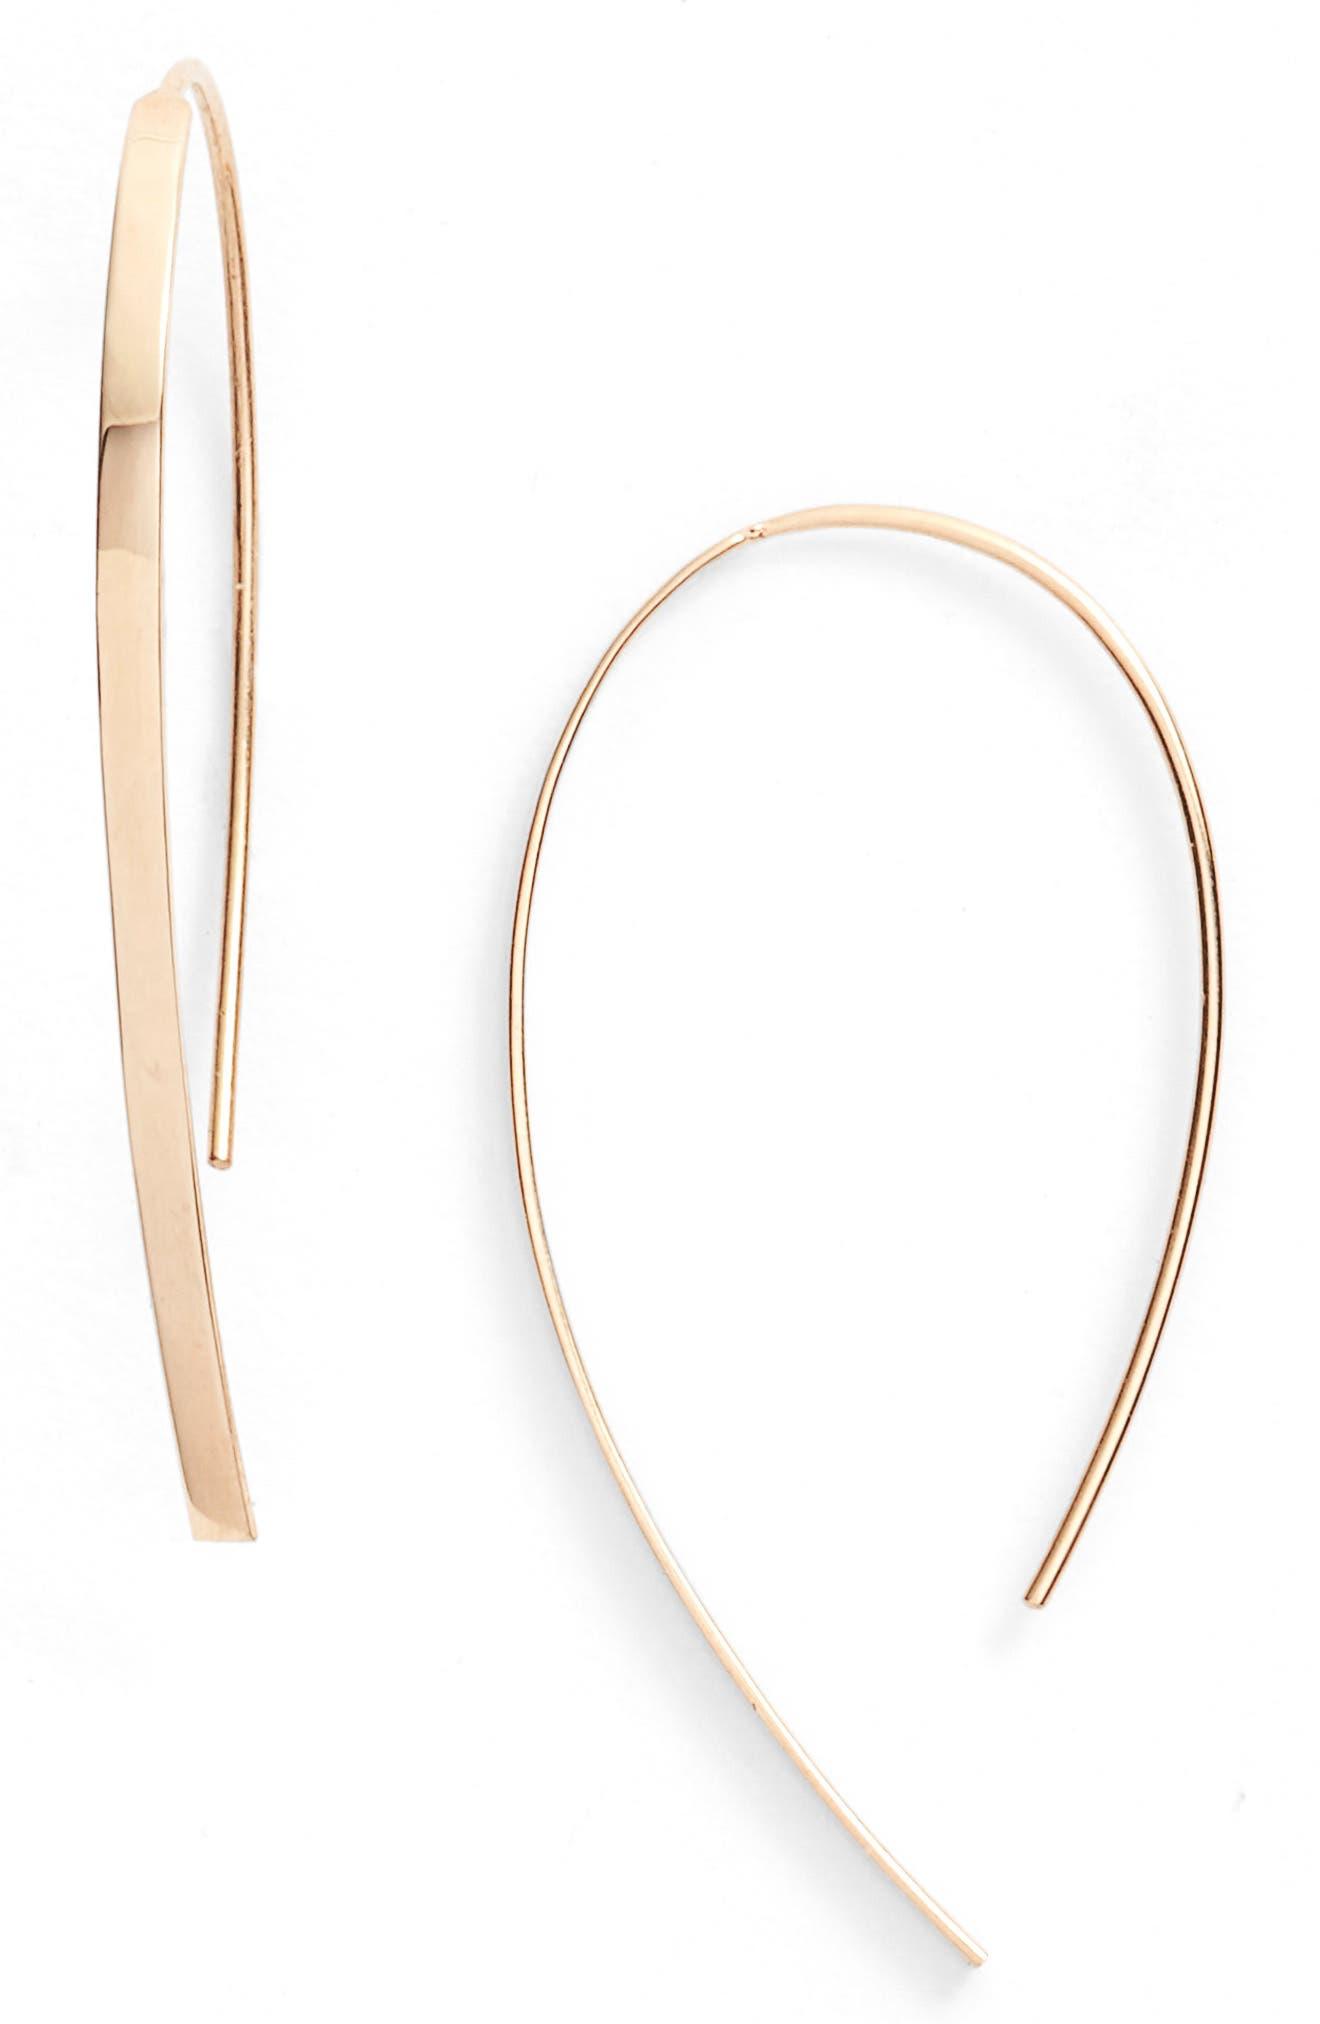 Mini Flat Hooked On Hoop Earrings,                             Main thumbnail 1, color,                             YELLOW GOLD